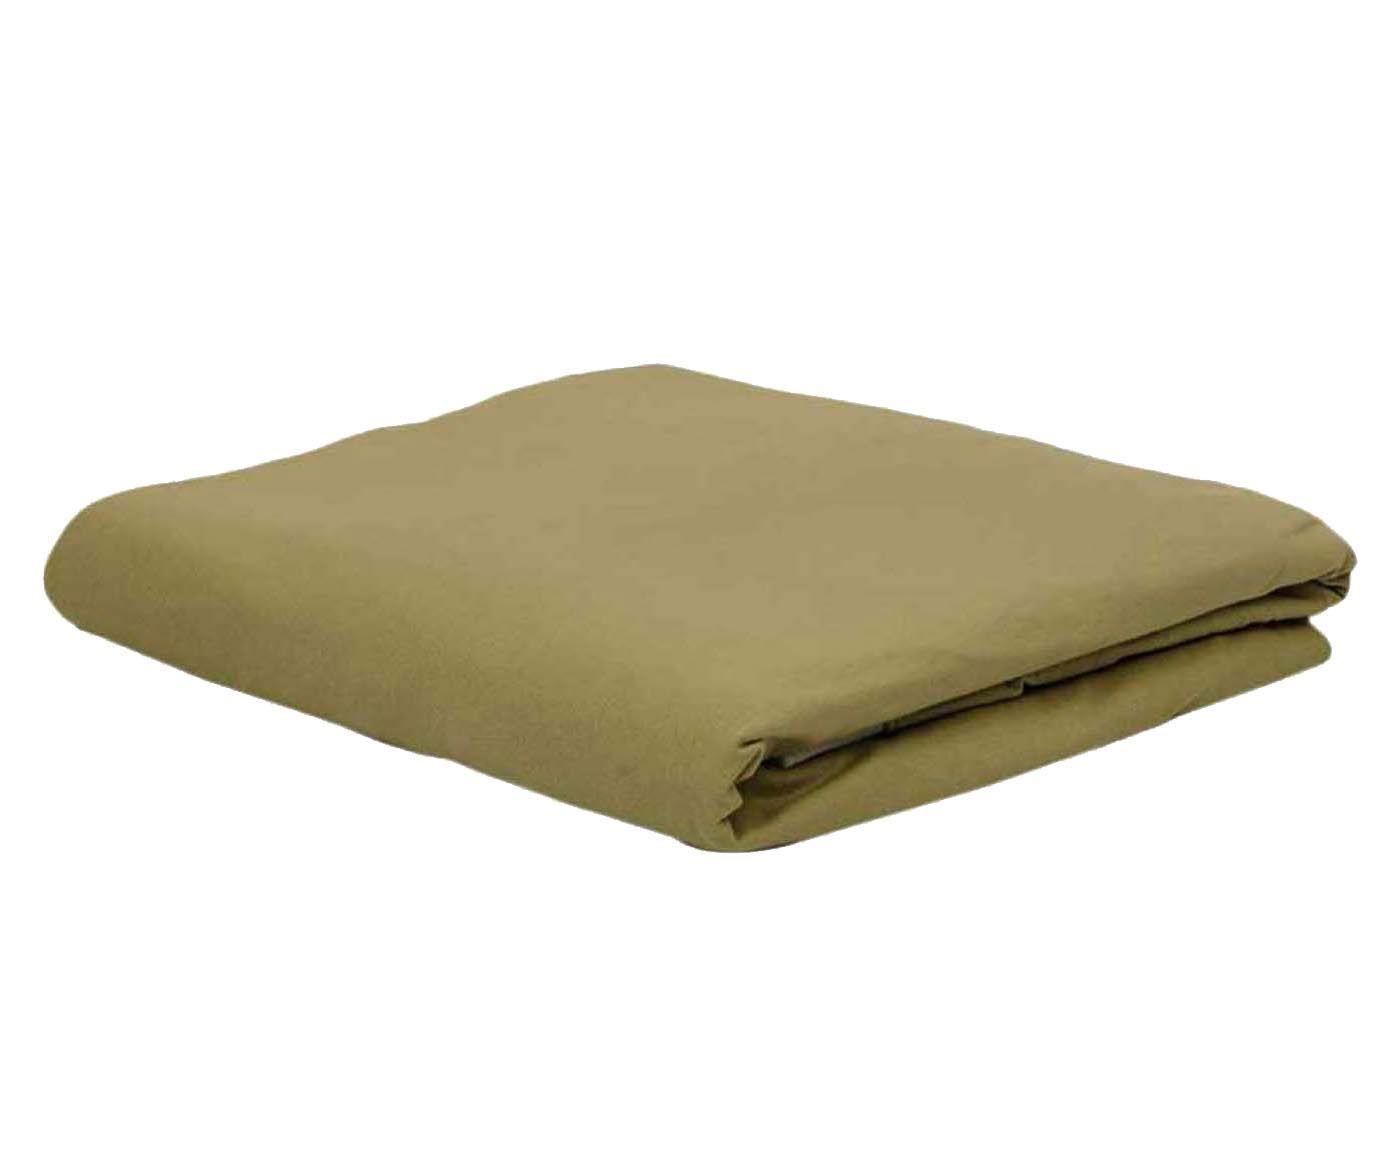 Lençol cosmos energy - para cama queen size | Westwing.com.br